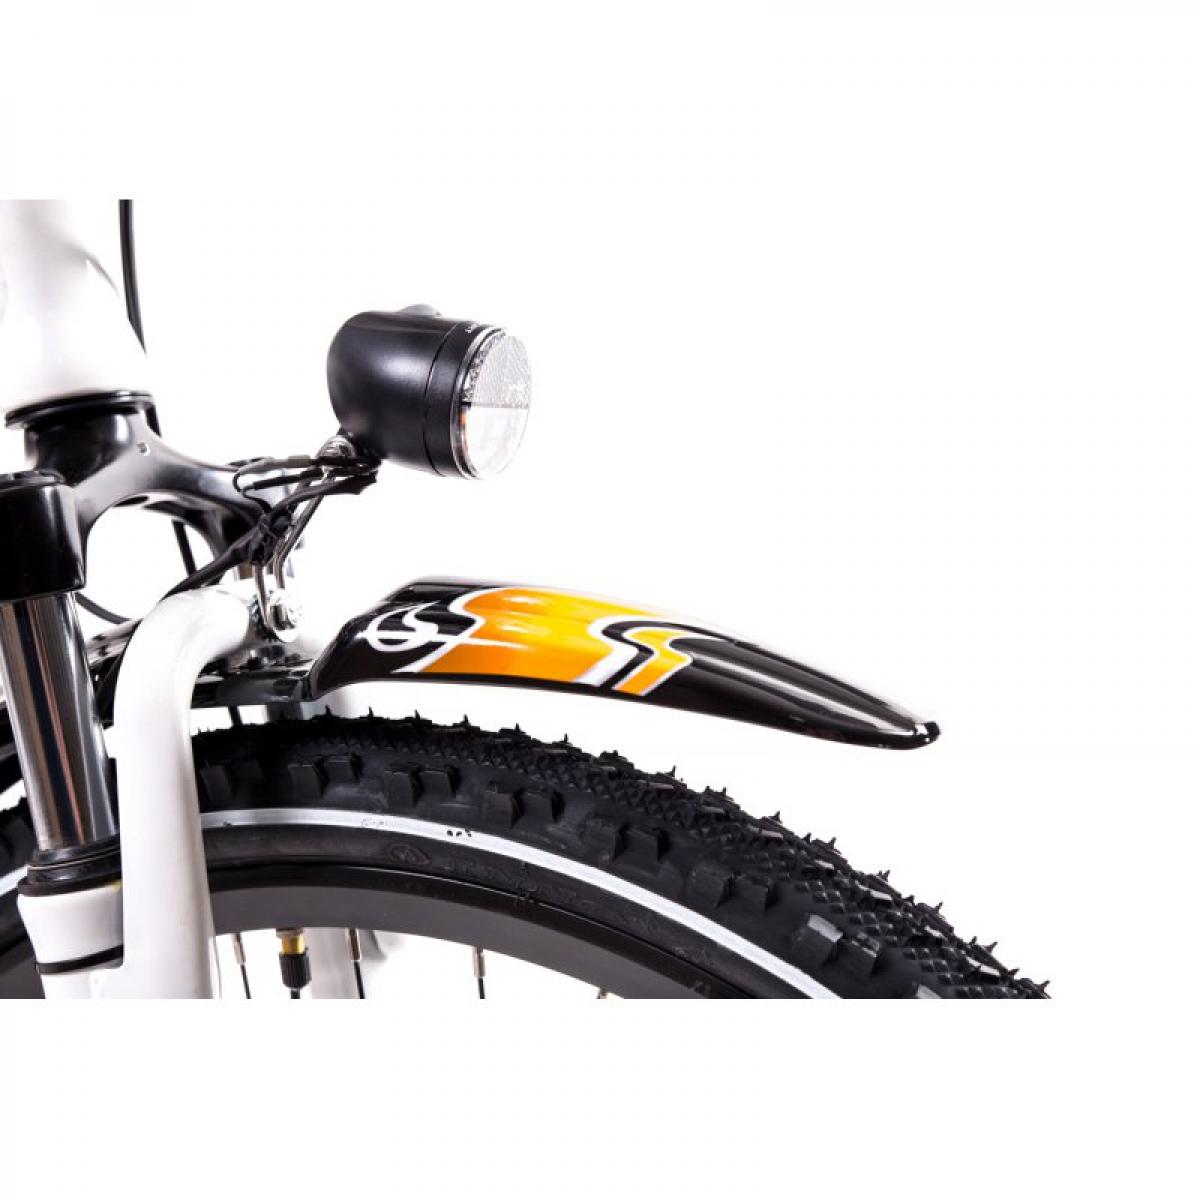 26 zoll mtb cross mifa fahrrad bike shimano 21 gang nabendynamo scheibenbremsen ihr fahrrad. Black Bedroom Furniture Sets. Home Design Ideas